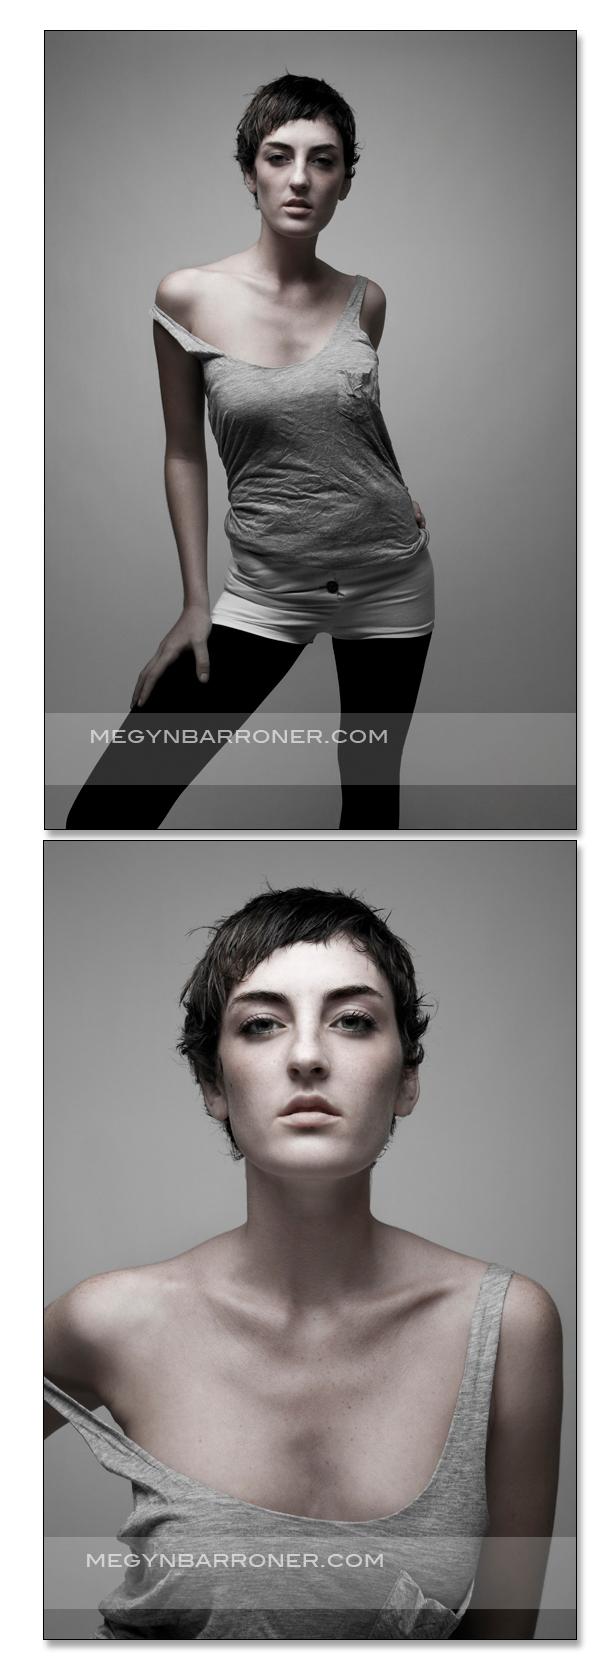 New Bedford, MA Jul 18, 2008 Megyn Barroner Model: Naomi